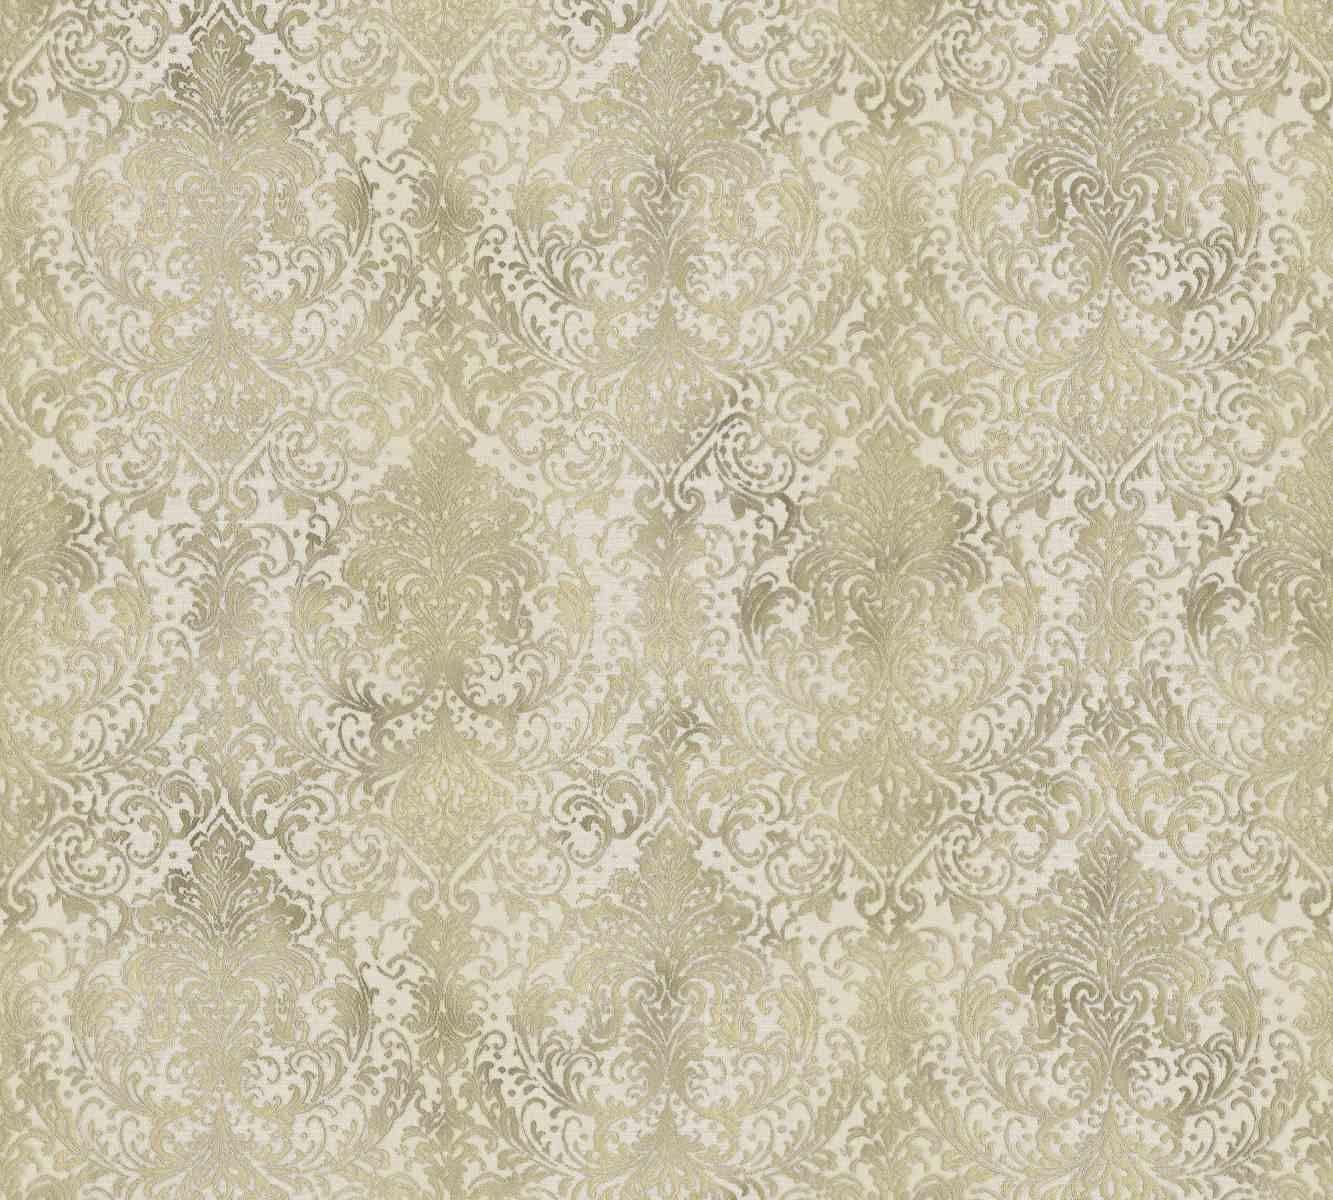 mystique classic damask wall paper beige metallic 959101